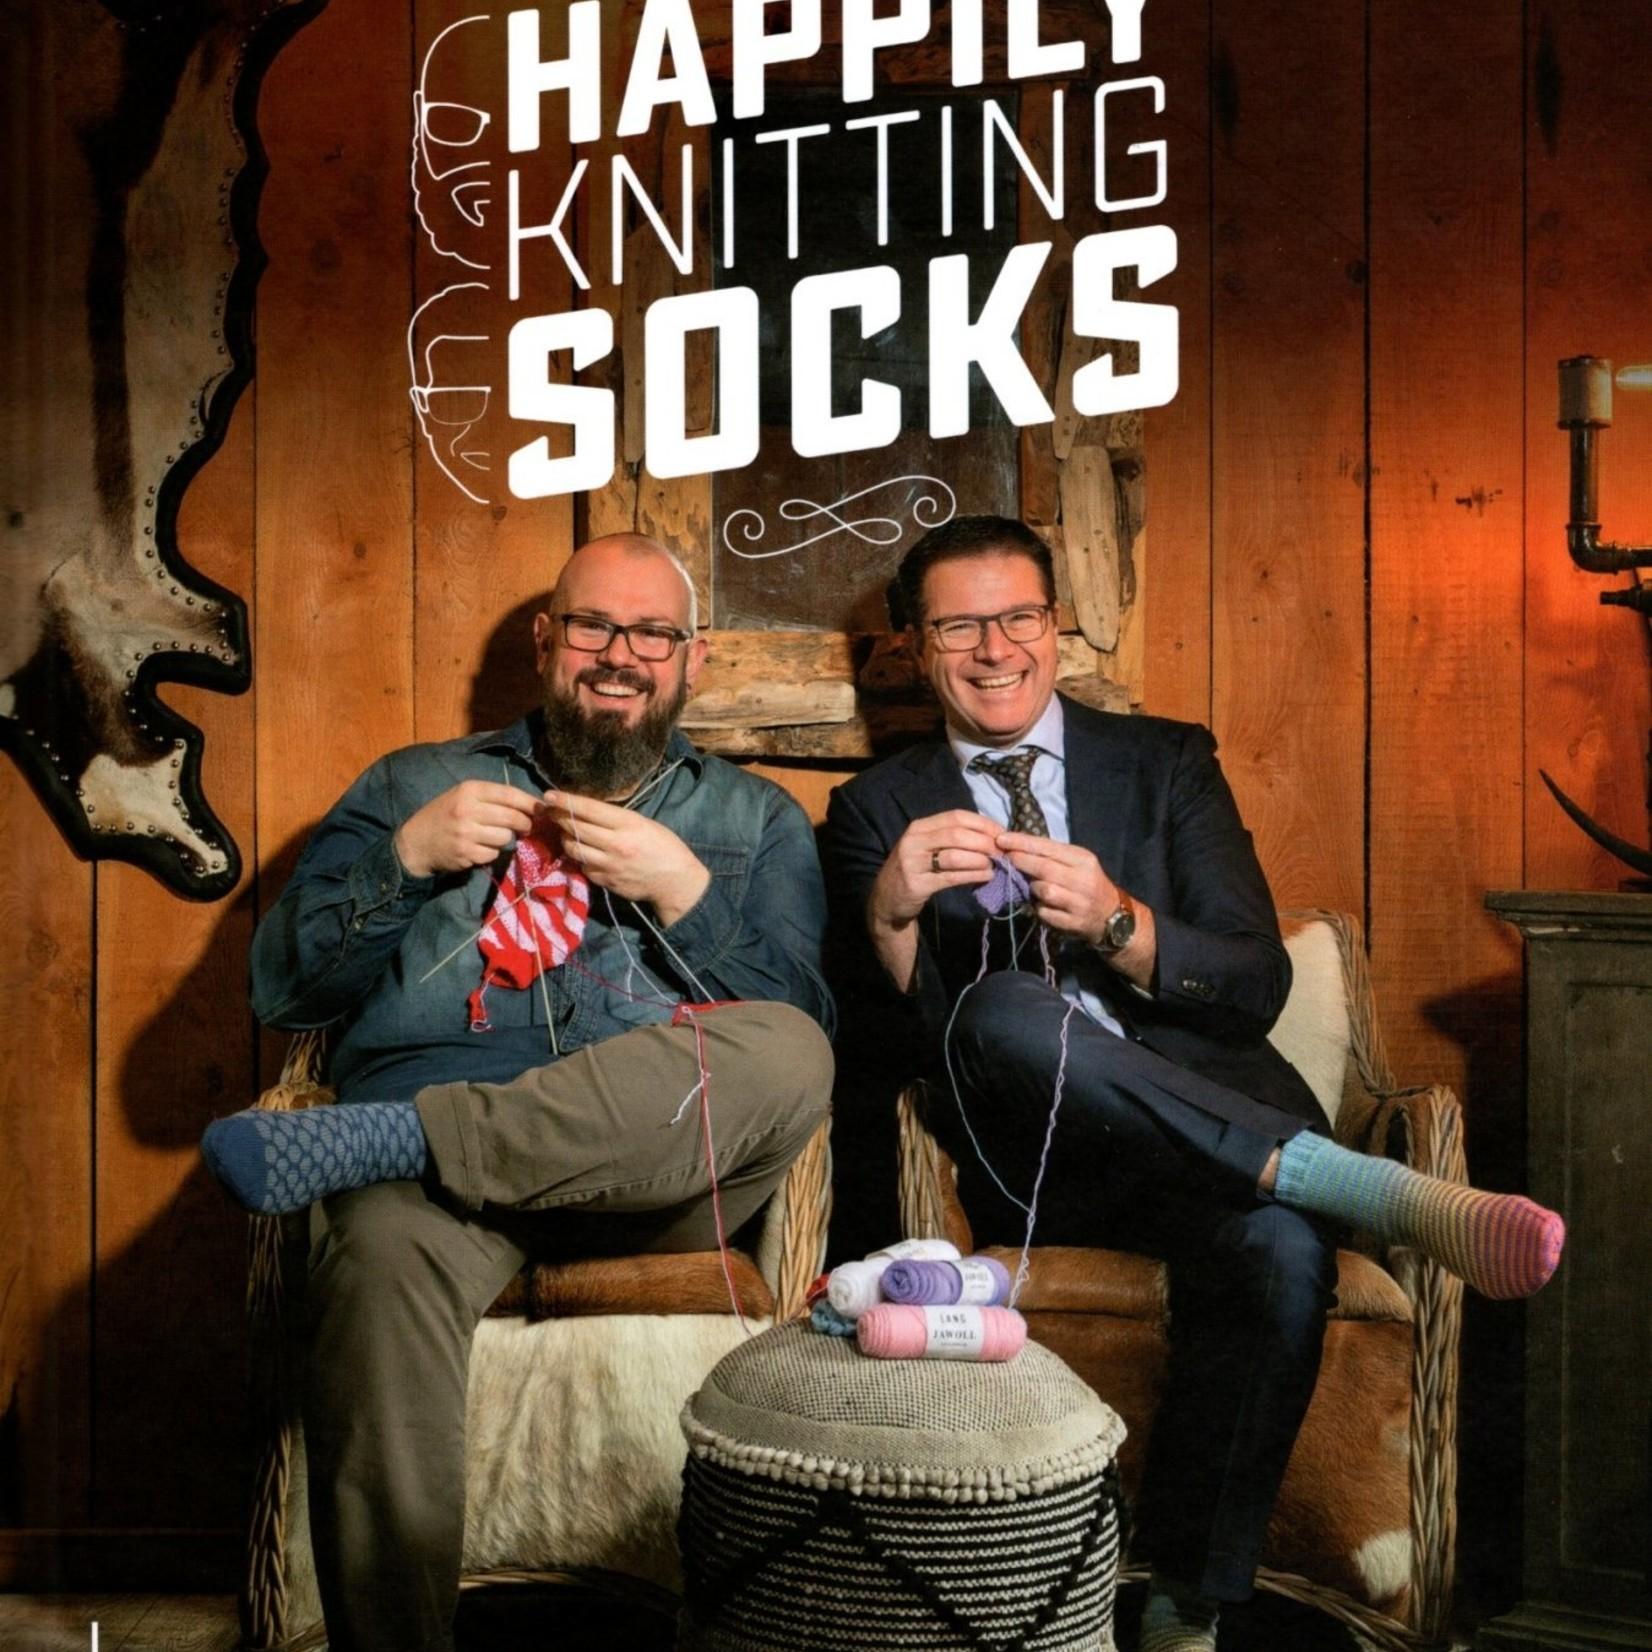 Happily Knitting Socks - Mr. Knitbear & Dendennis